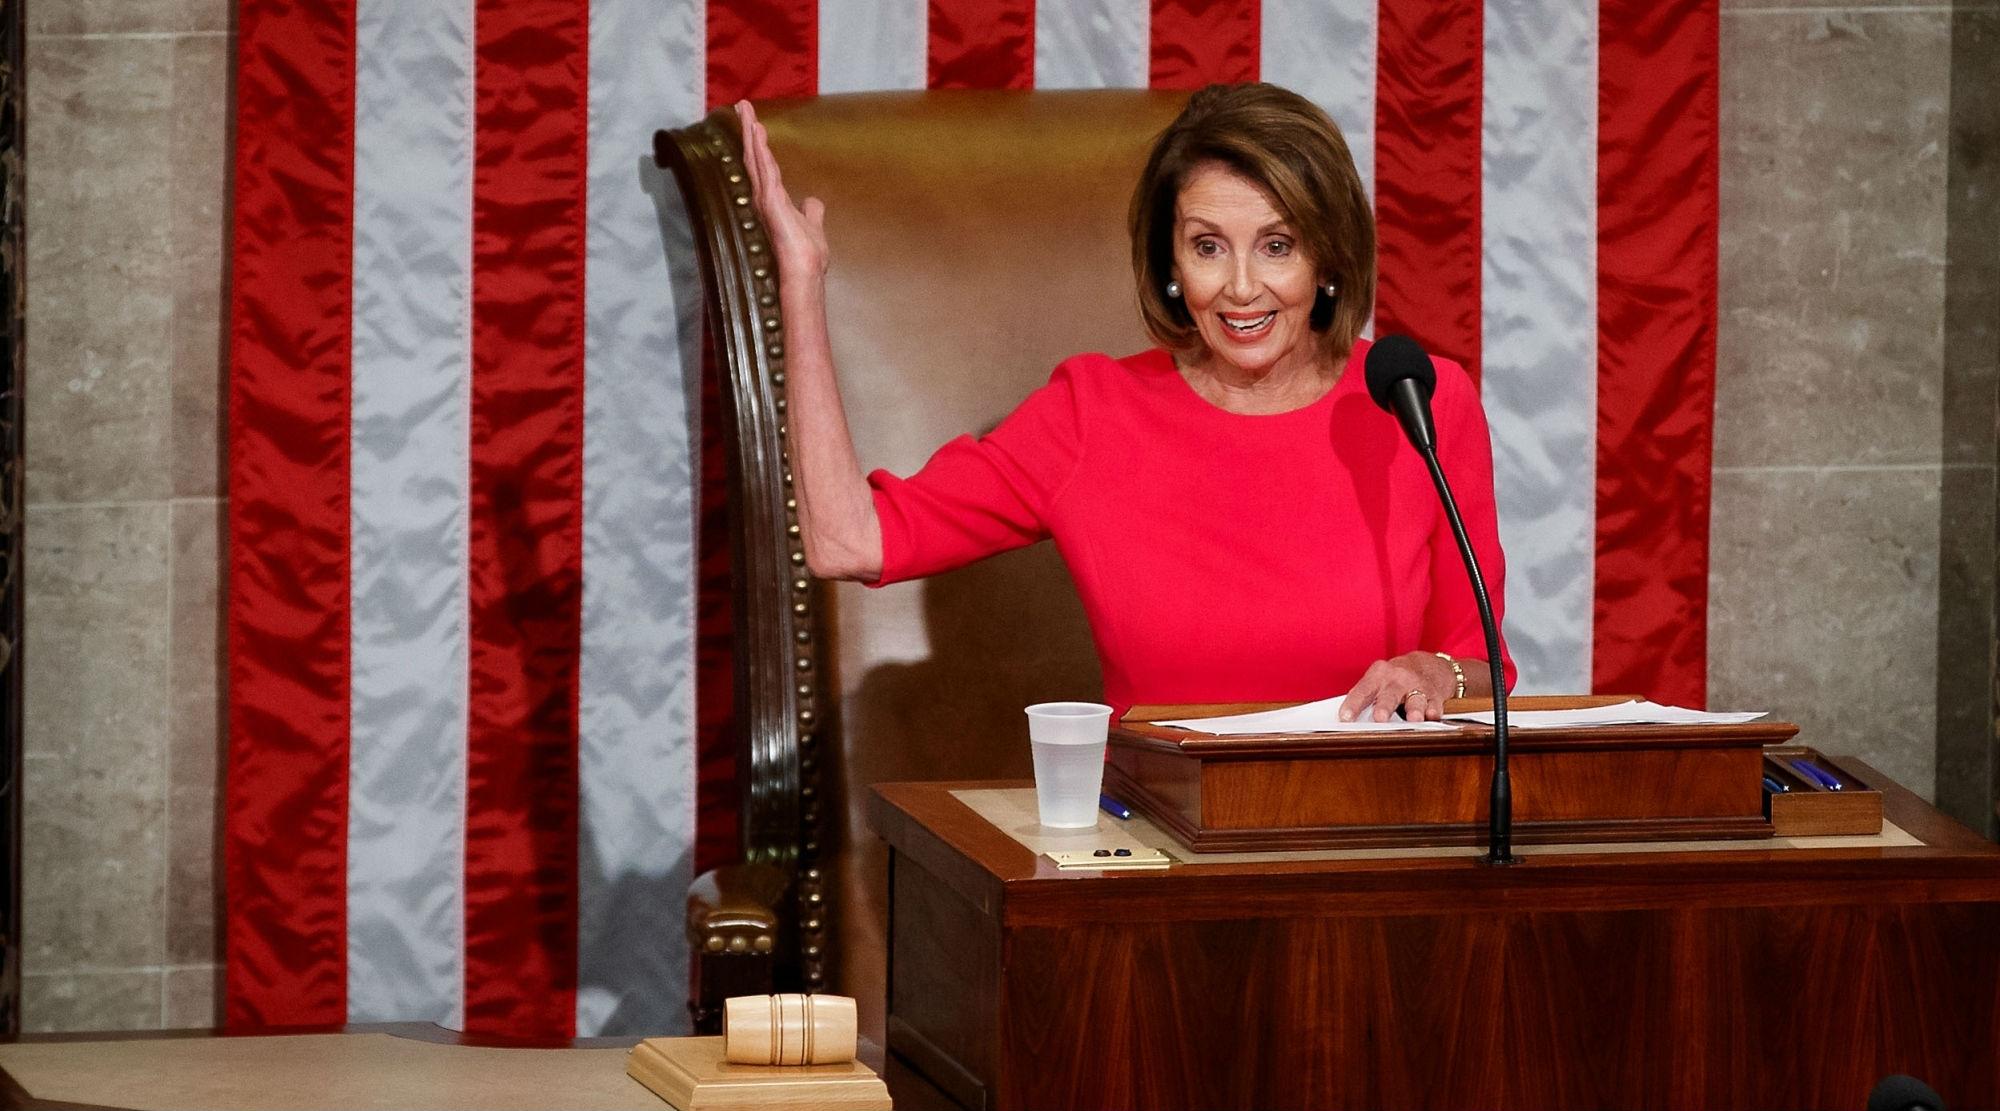 Donald Trump Faces Impeachment Probe Over Controversial Call to Ukrainian President, Announces US House Speaker Nancy Pelosi